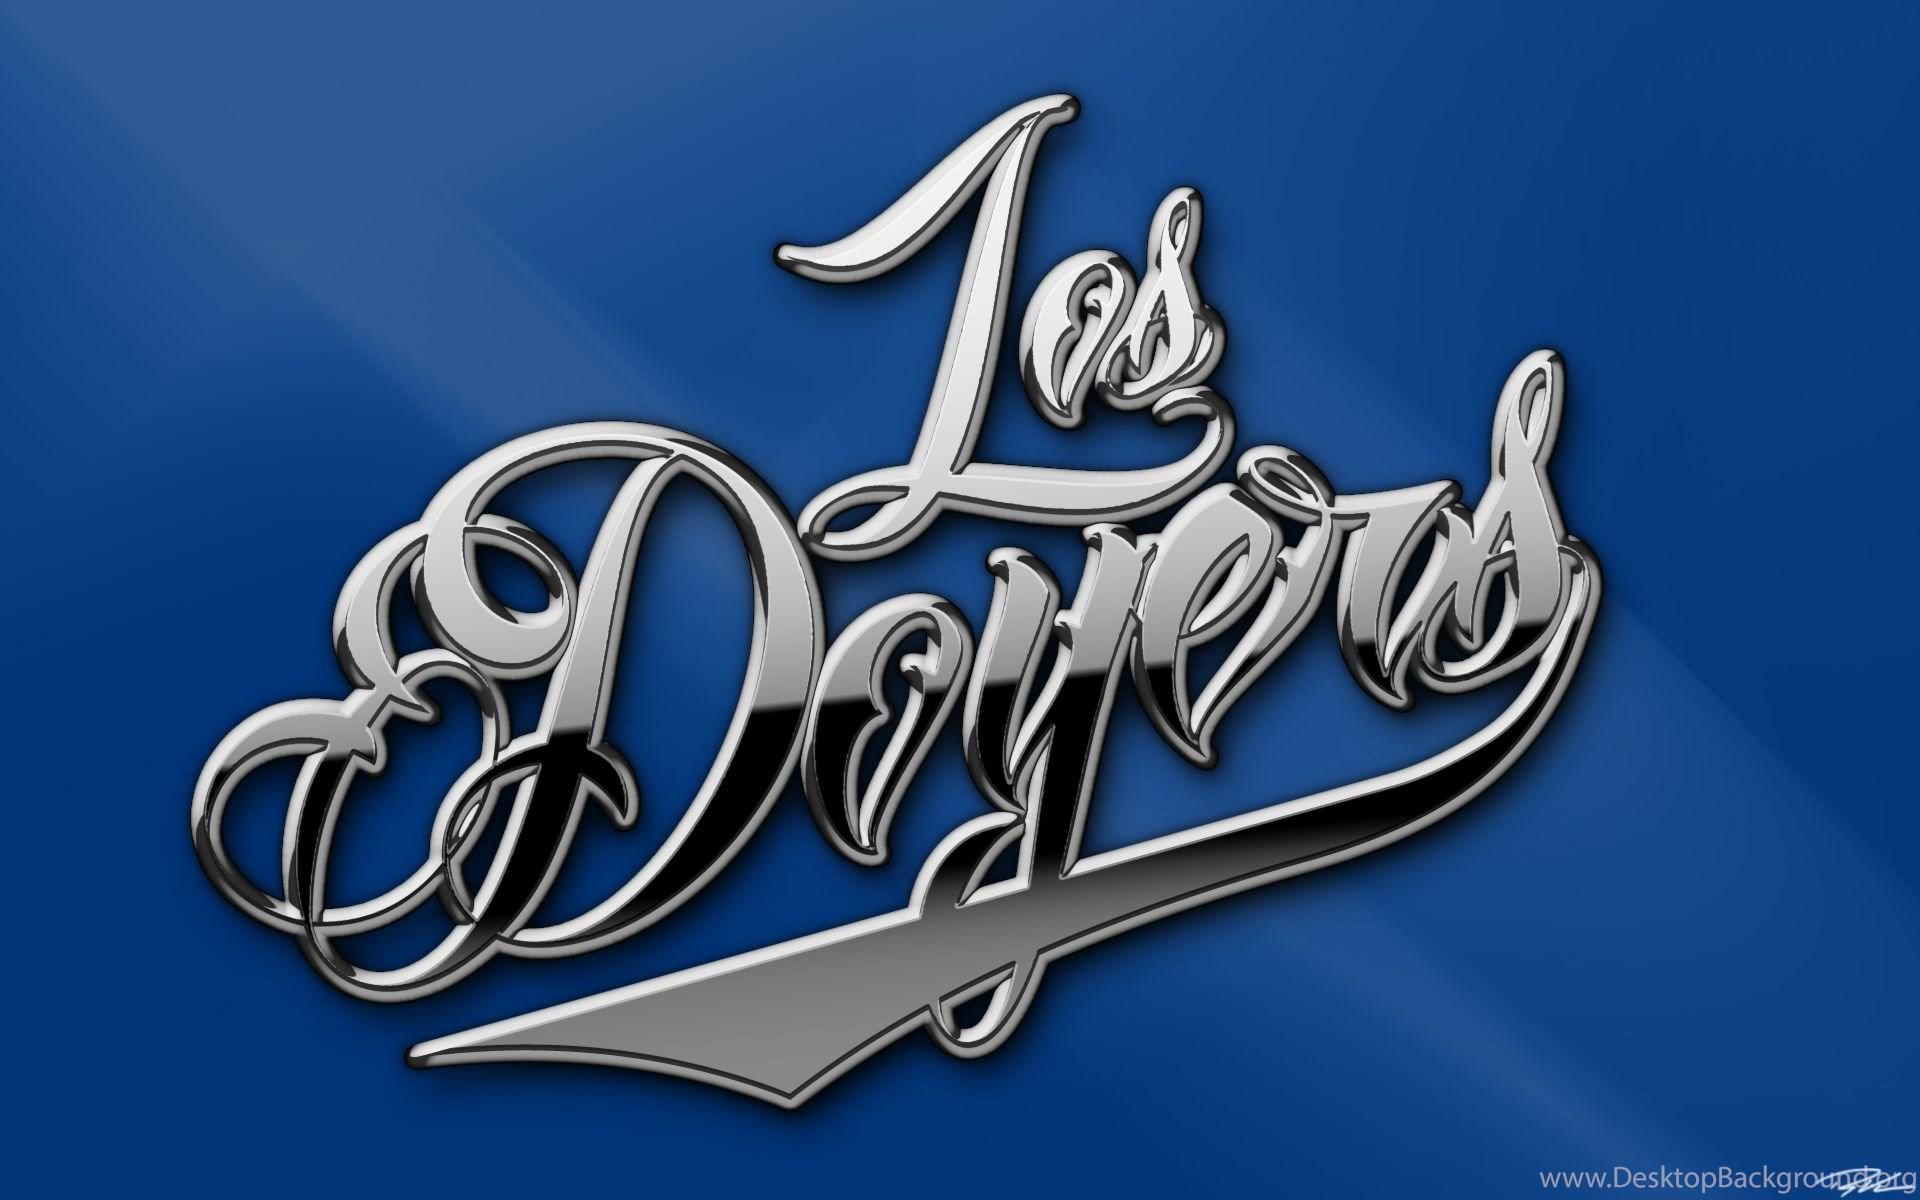 Gallery For La Dodgers Wallpapers Free Desktop Background